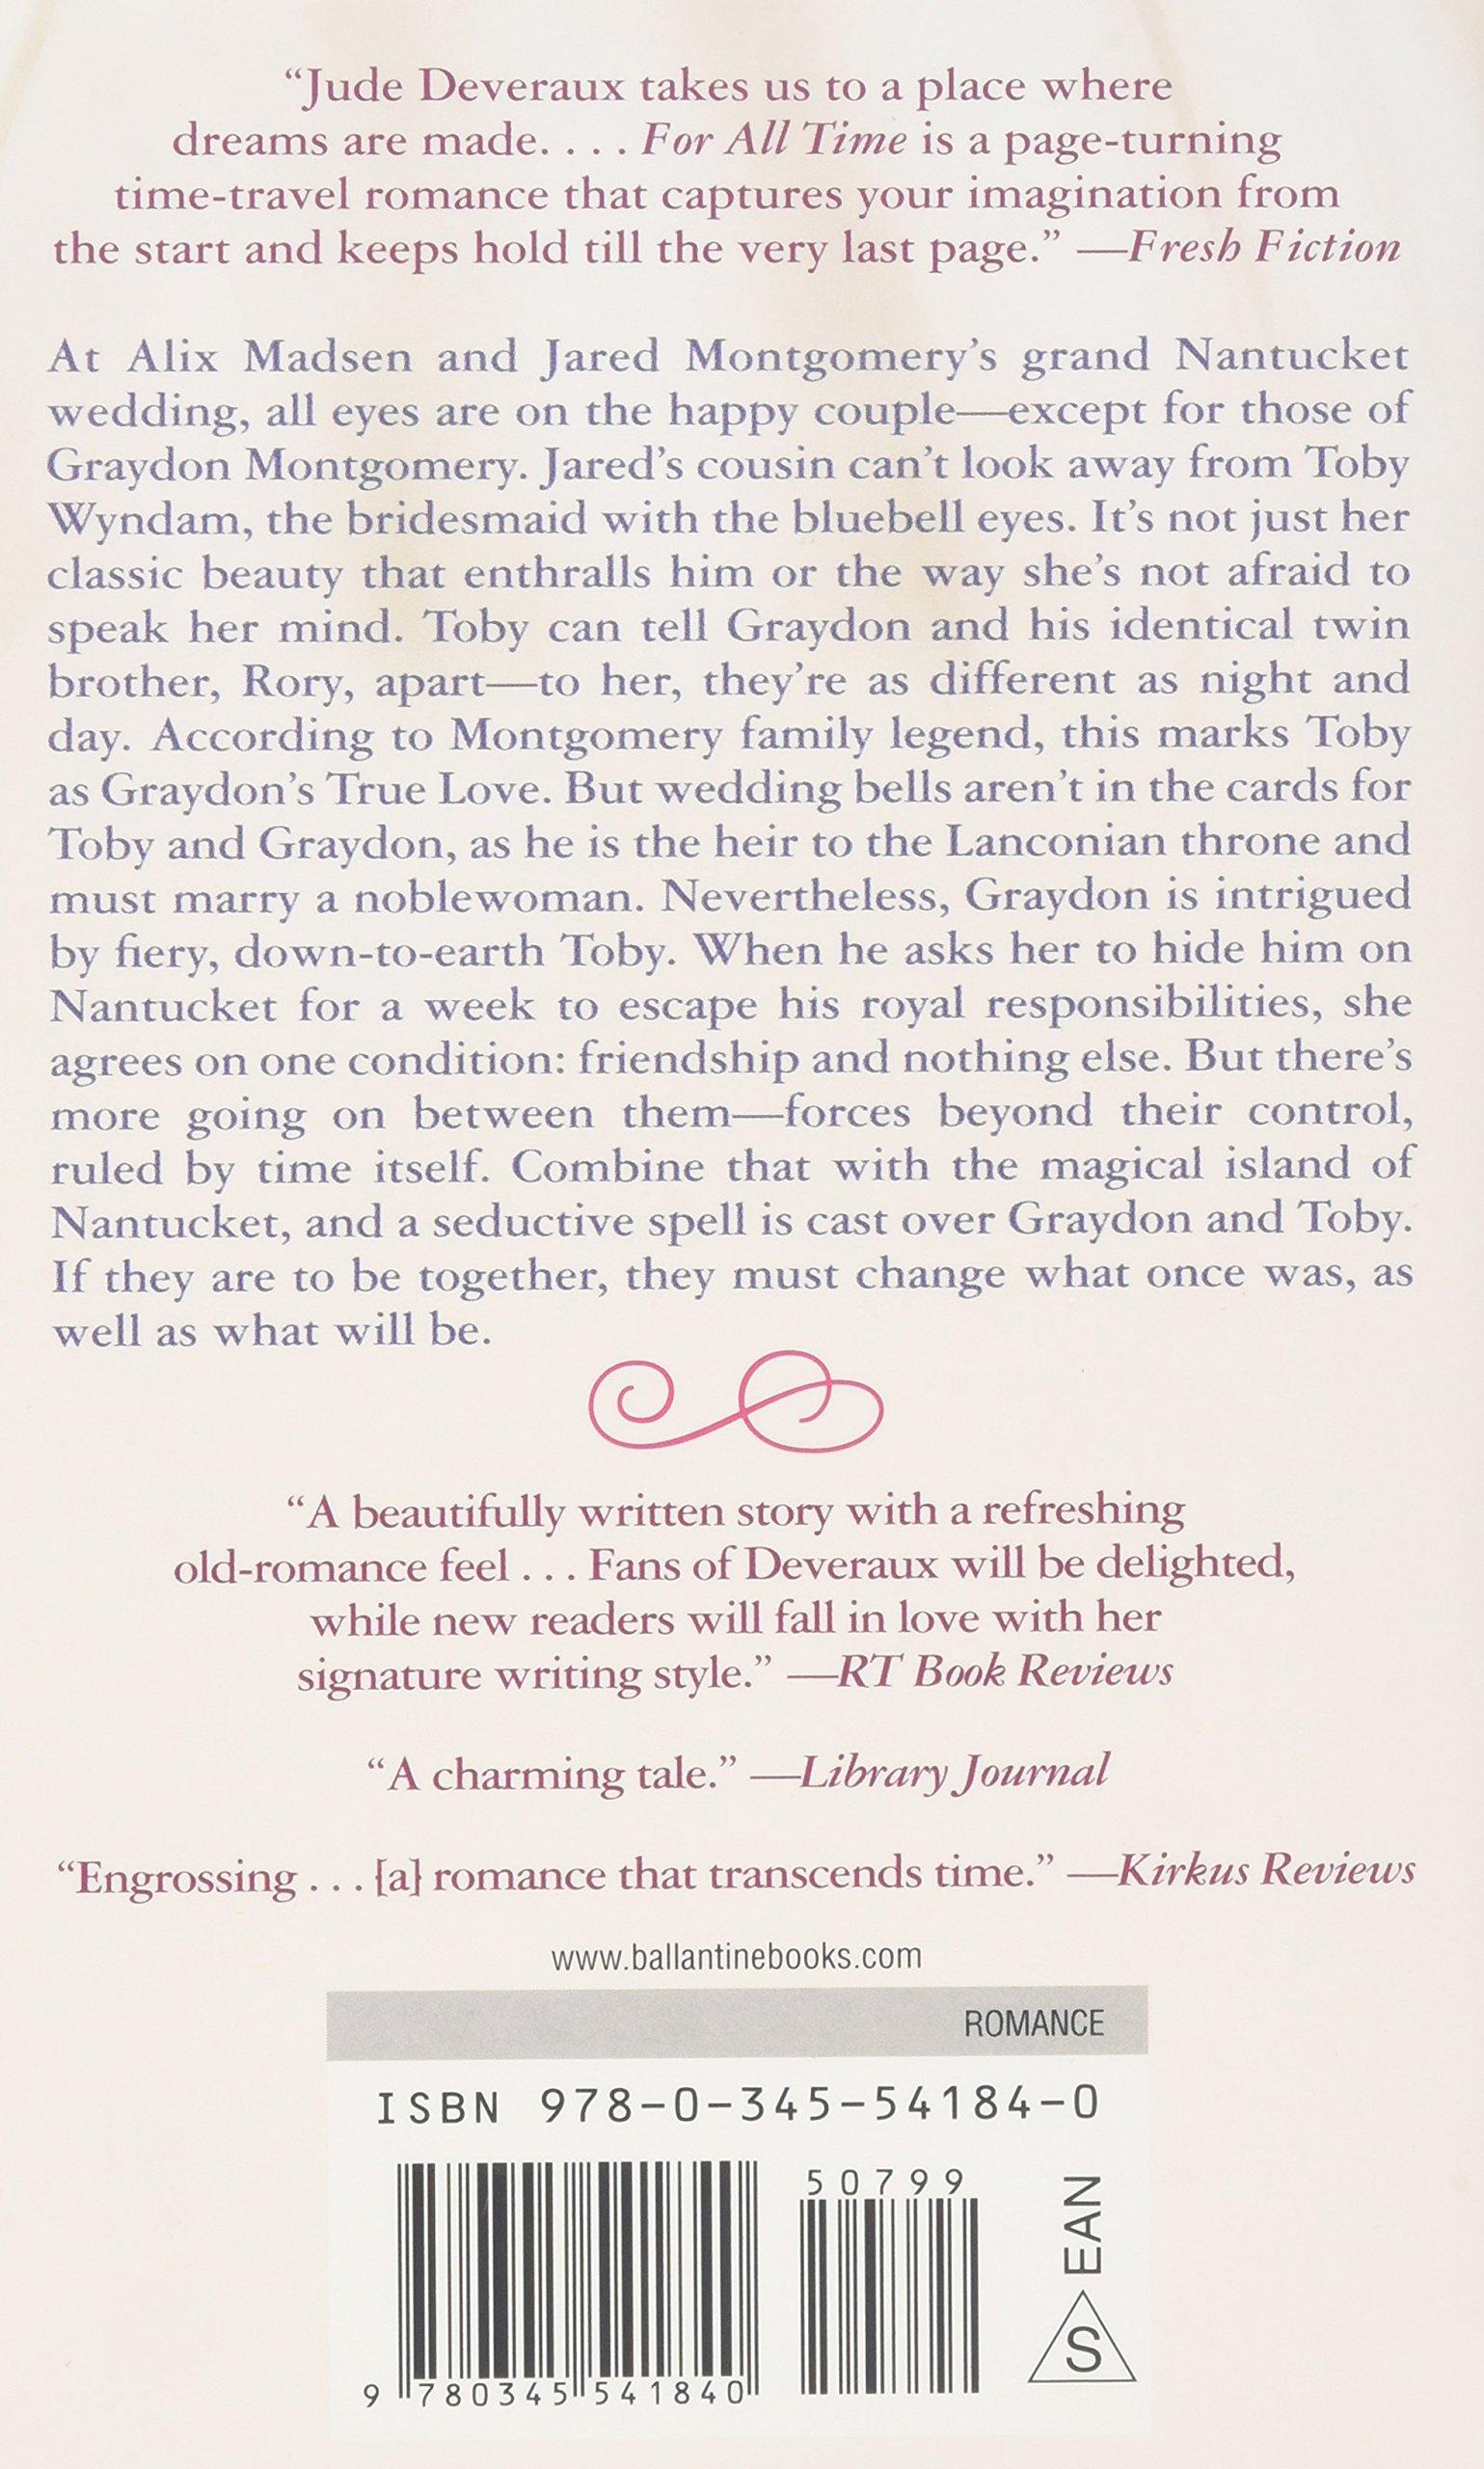 For All Time: A Nantucket Brides Novel (nantucket Brides Trilogy): Jude  Deveraux: 9780345541840: Amazon: Books